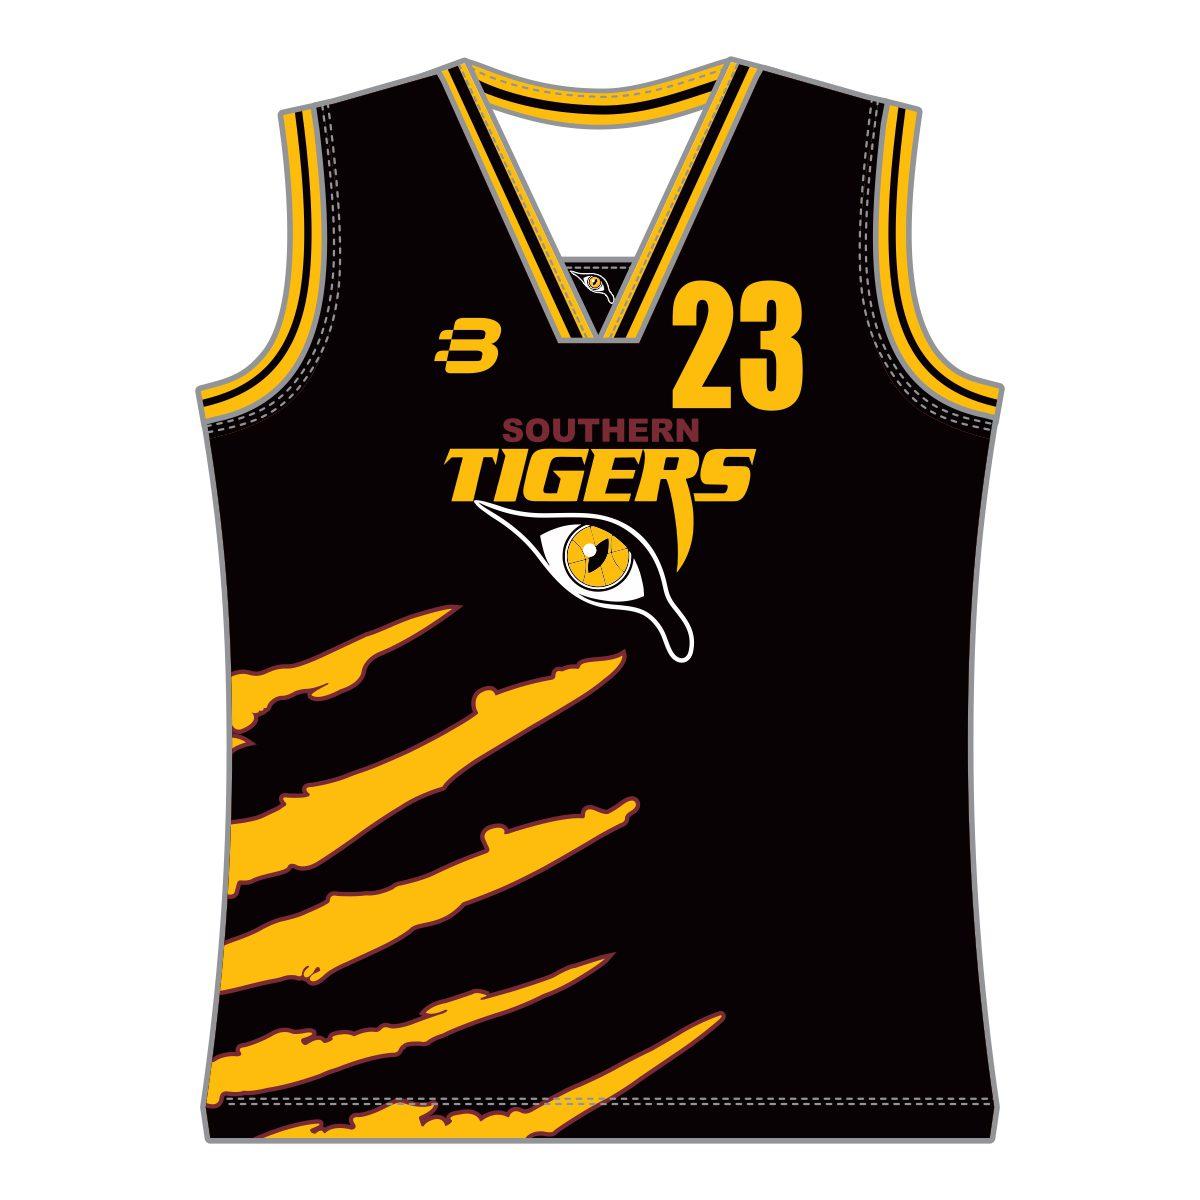 7e1ffdad15a Southern Tigers Basketball Club - Boys Basketball Singlet (Black) - VL65797  - Front